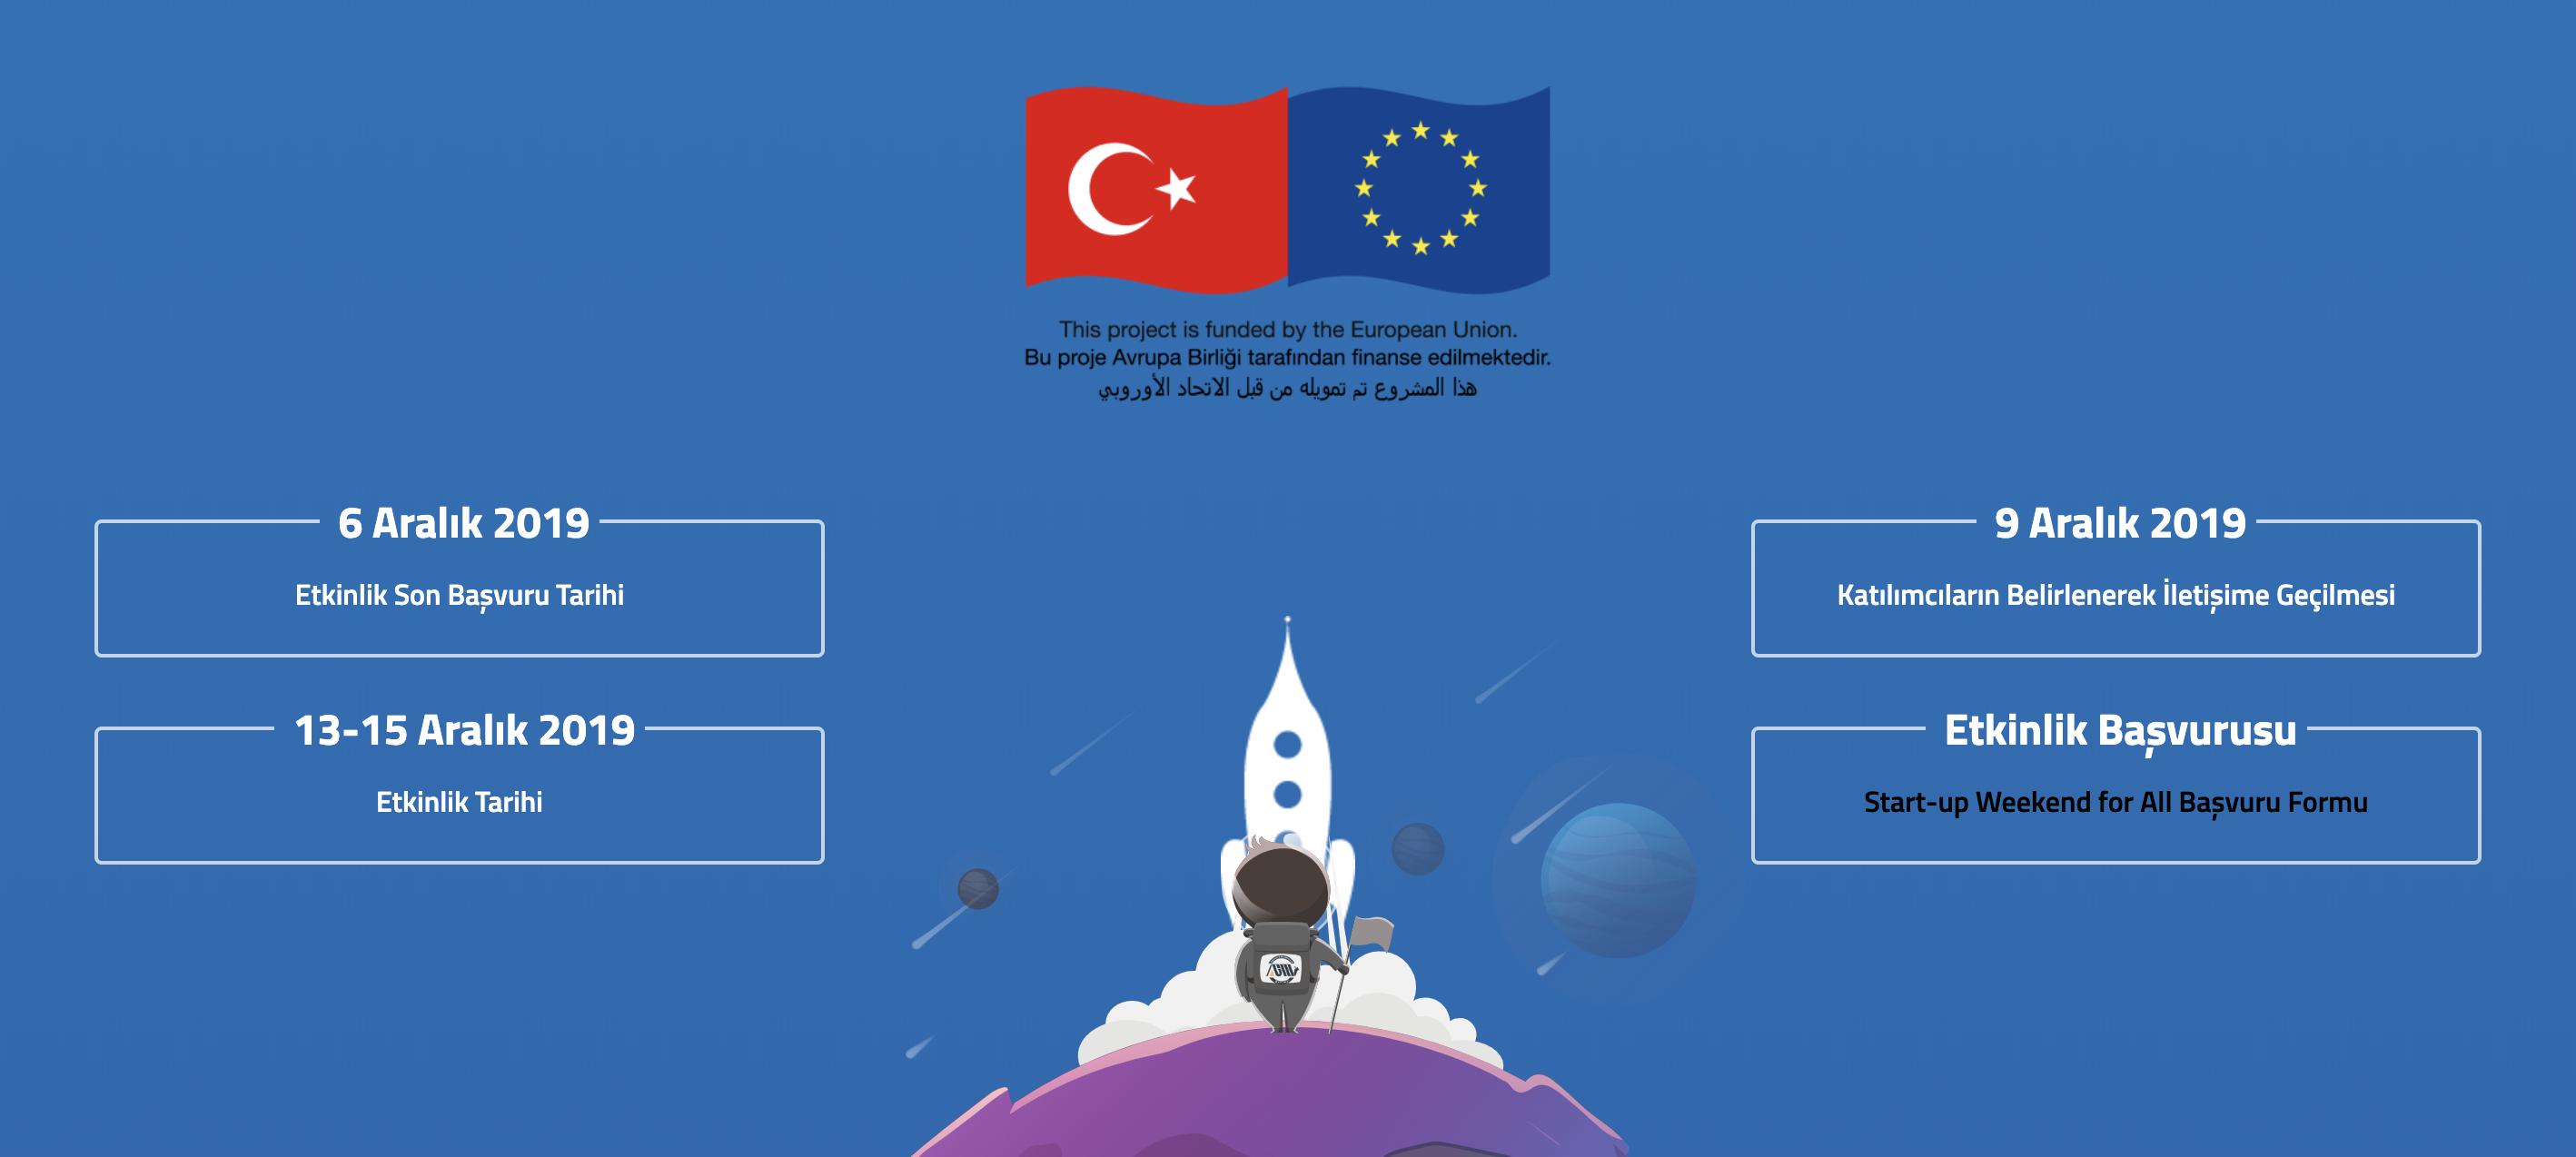 Startup Weekend For All, 13-15 Aralık'ta Adana'da